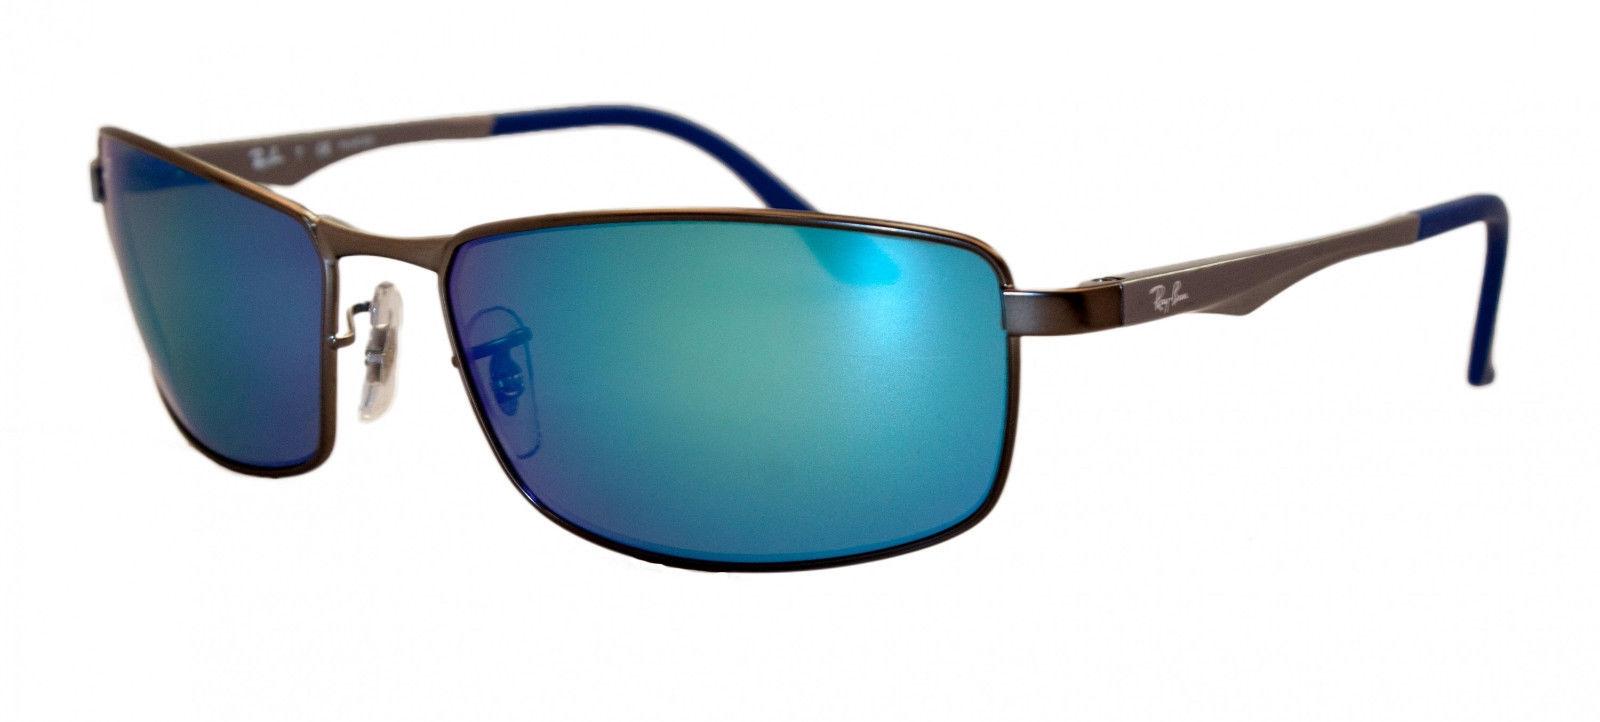 Ray Ban Sonnenbrille Sunglasses RB 3498 029 9R Gr 61 L6